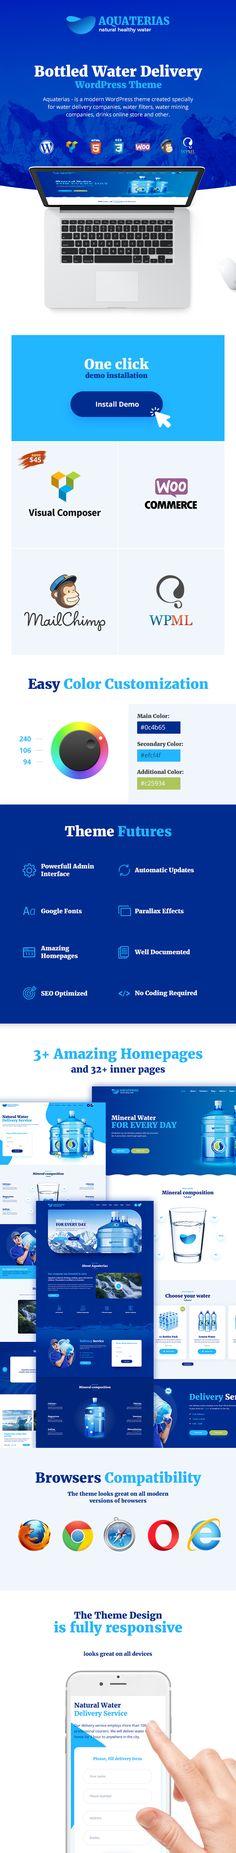 PLR Wordpress Themes: 40 High Quality Wordpress Themes (MRR) http ...